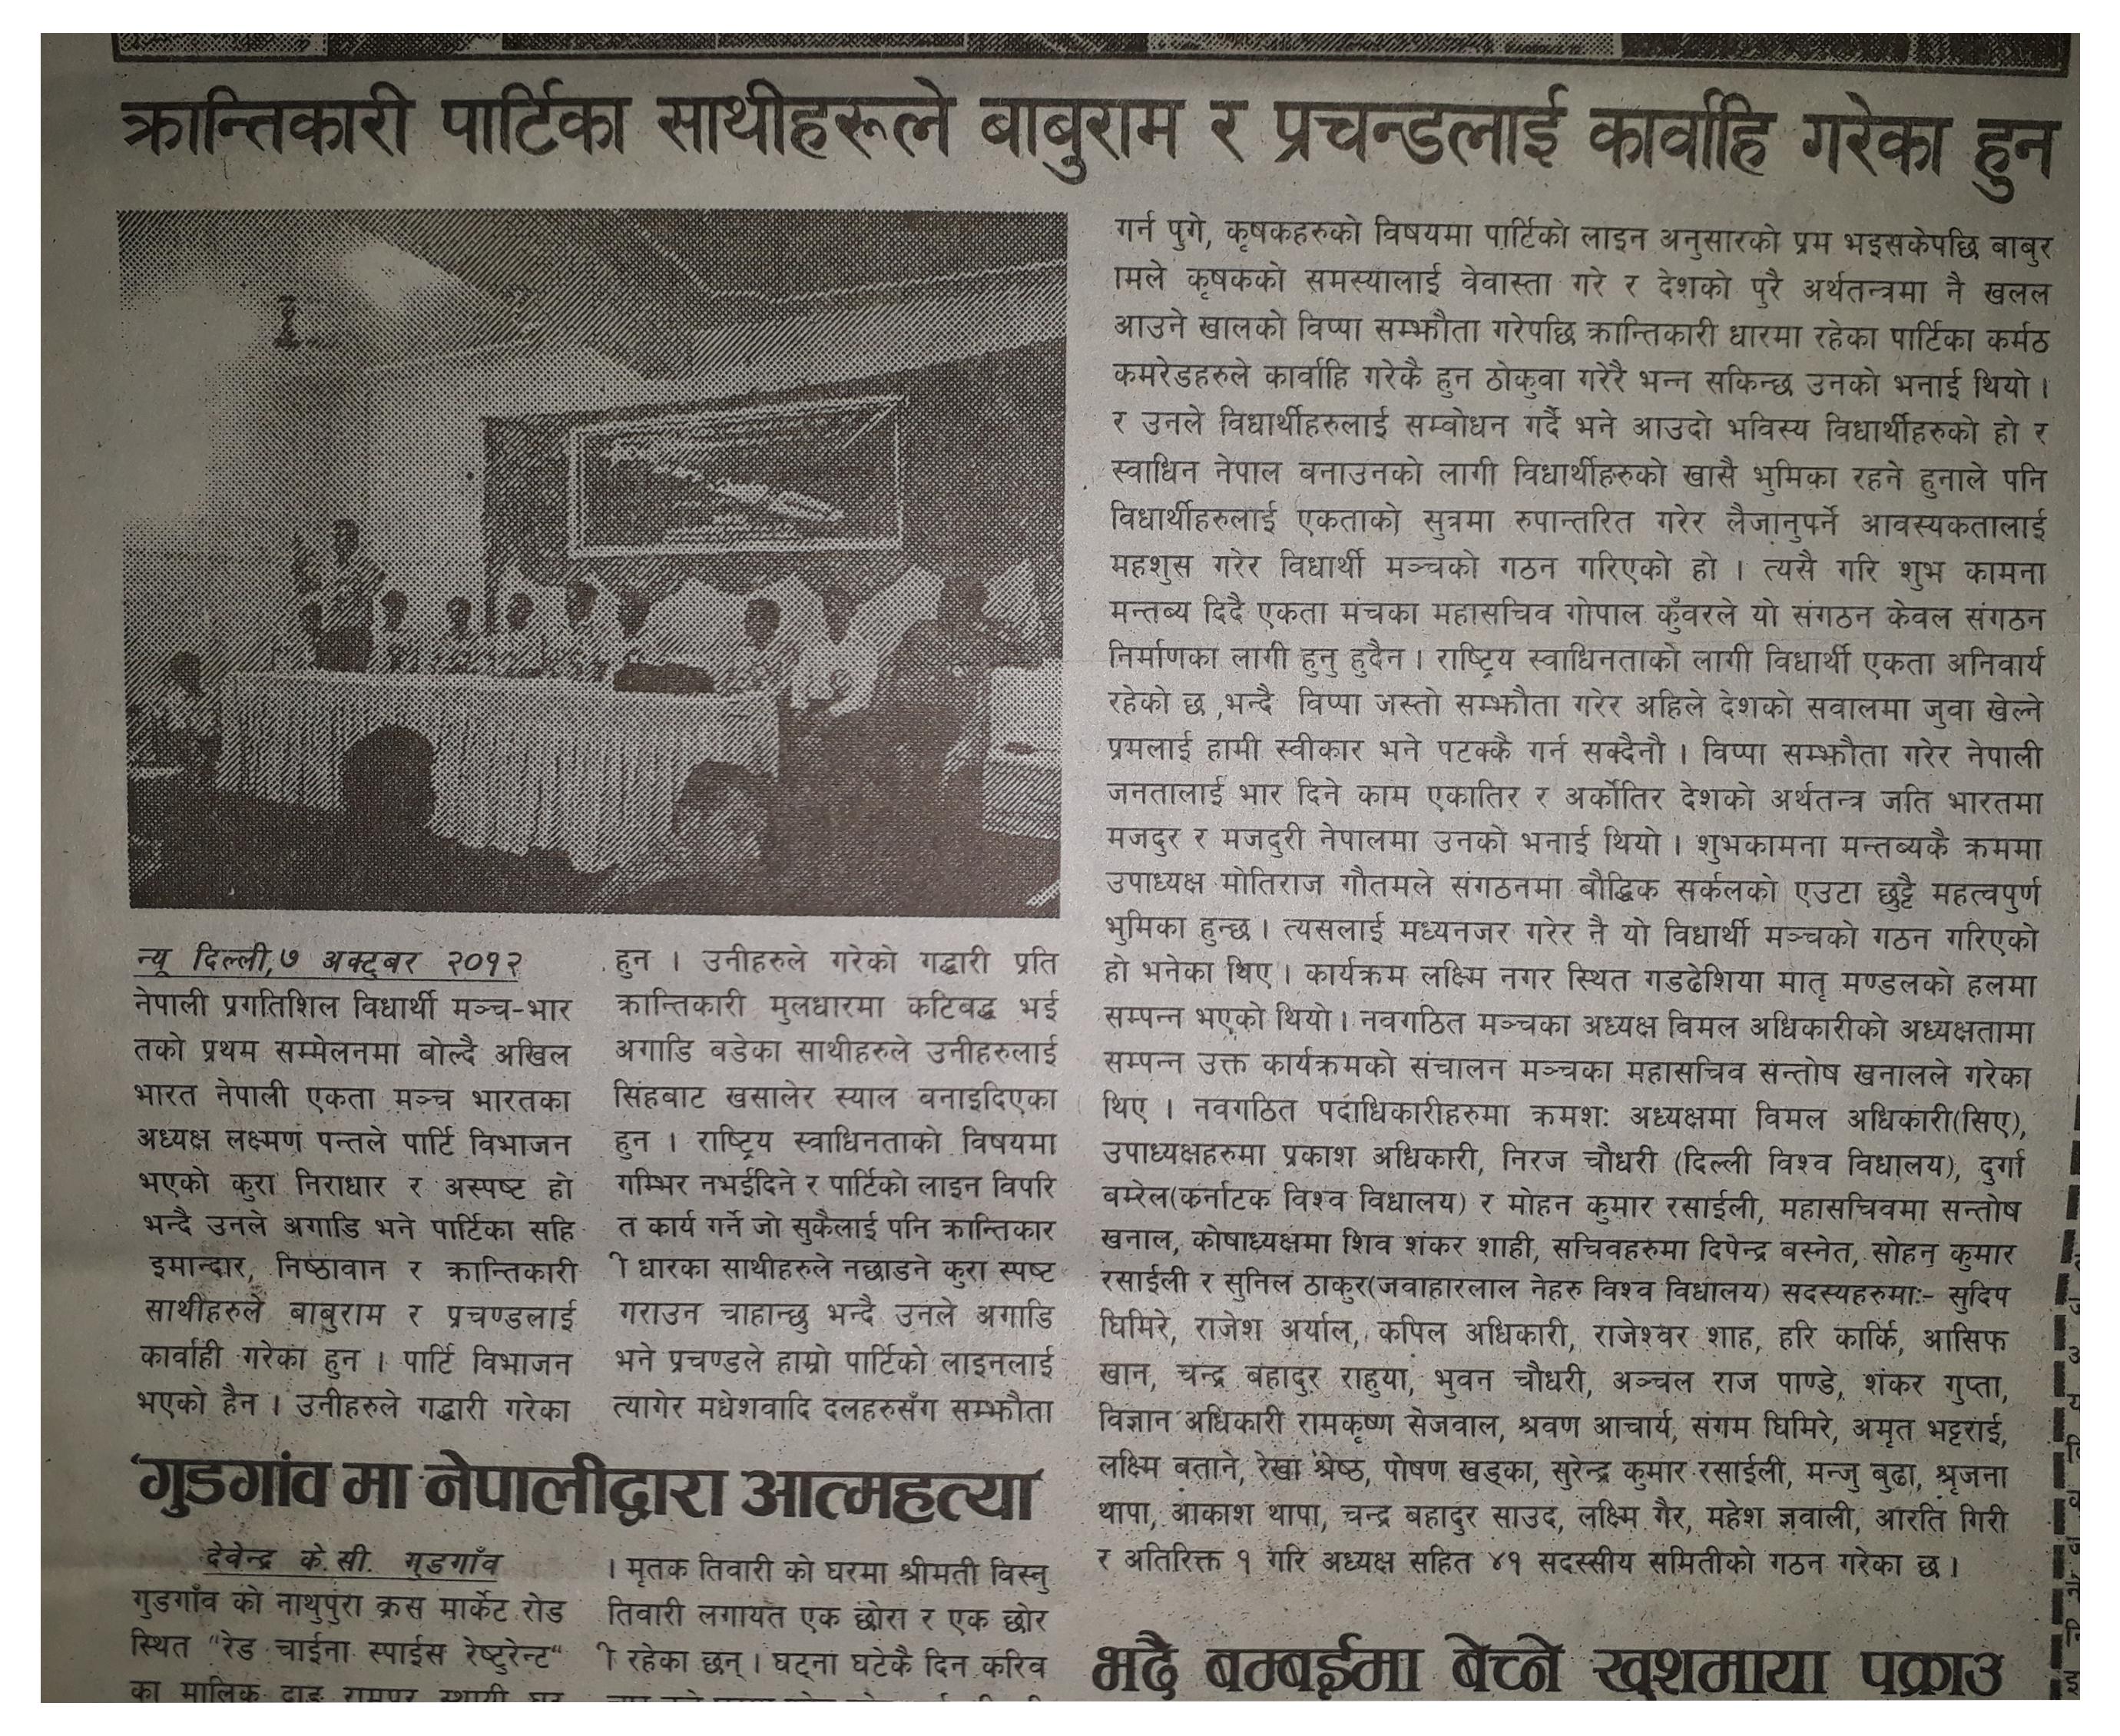 Program of Nepalese Progressive Student Forum